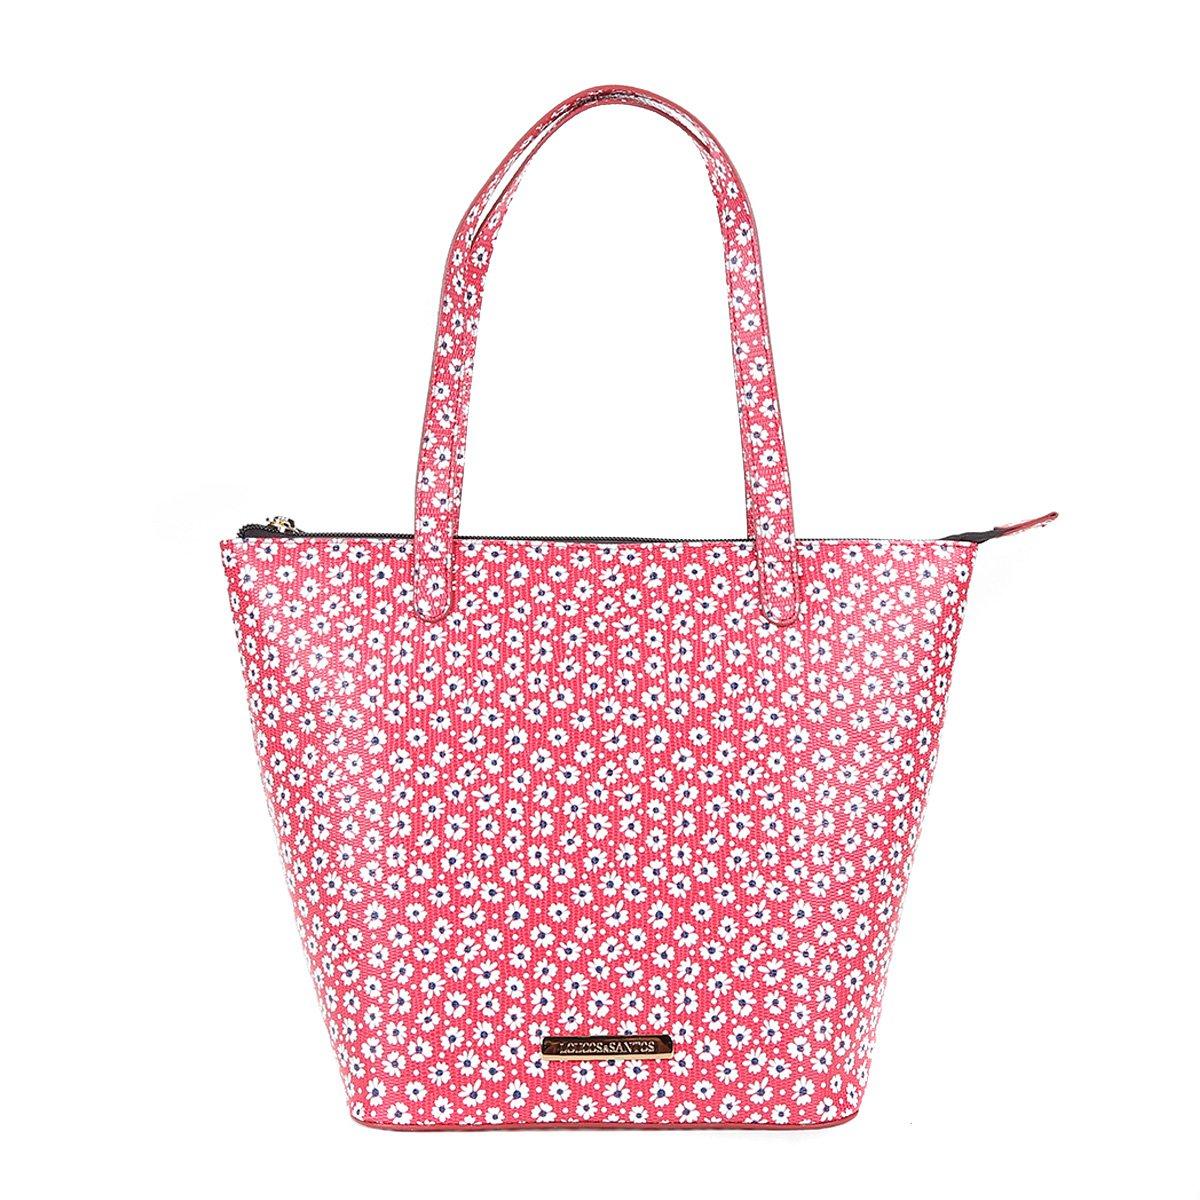 7874840b8 Bolsa Shopper Estampada Floral Loucos e Santos Feminina